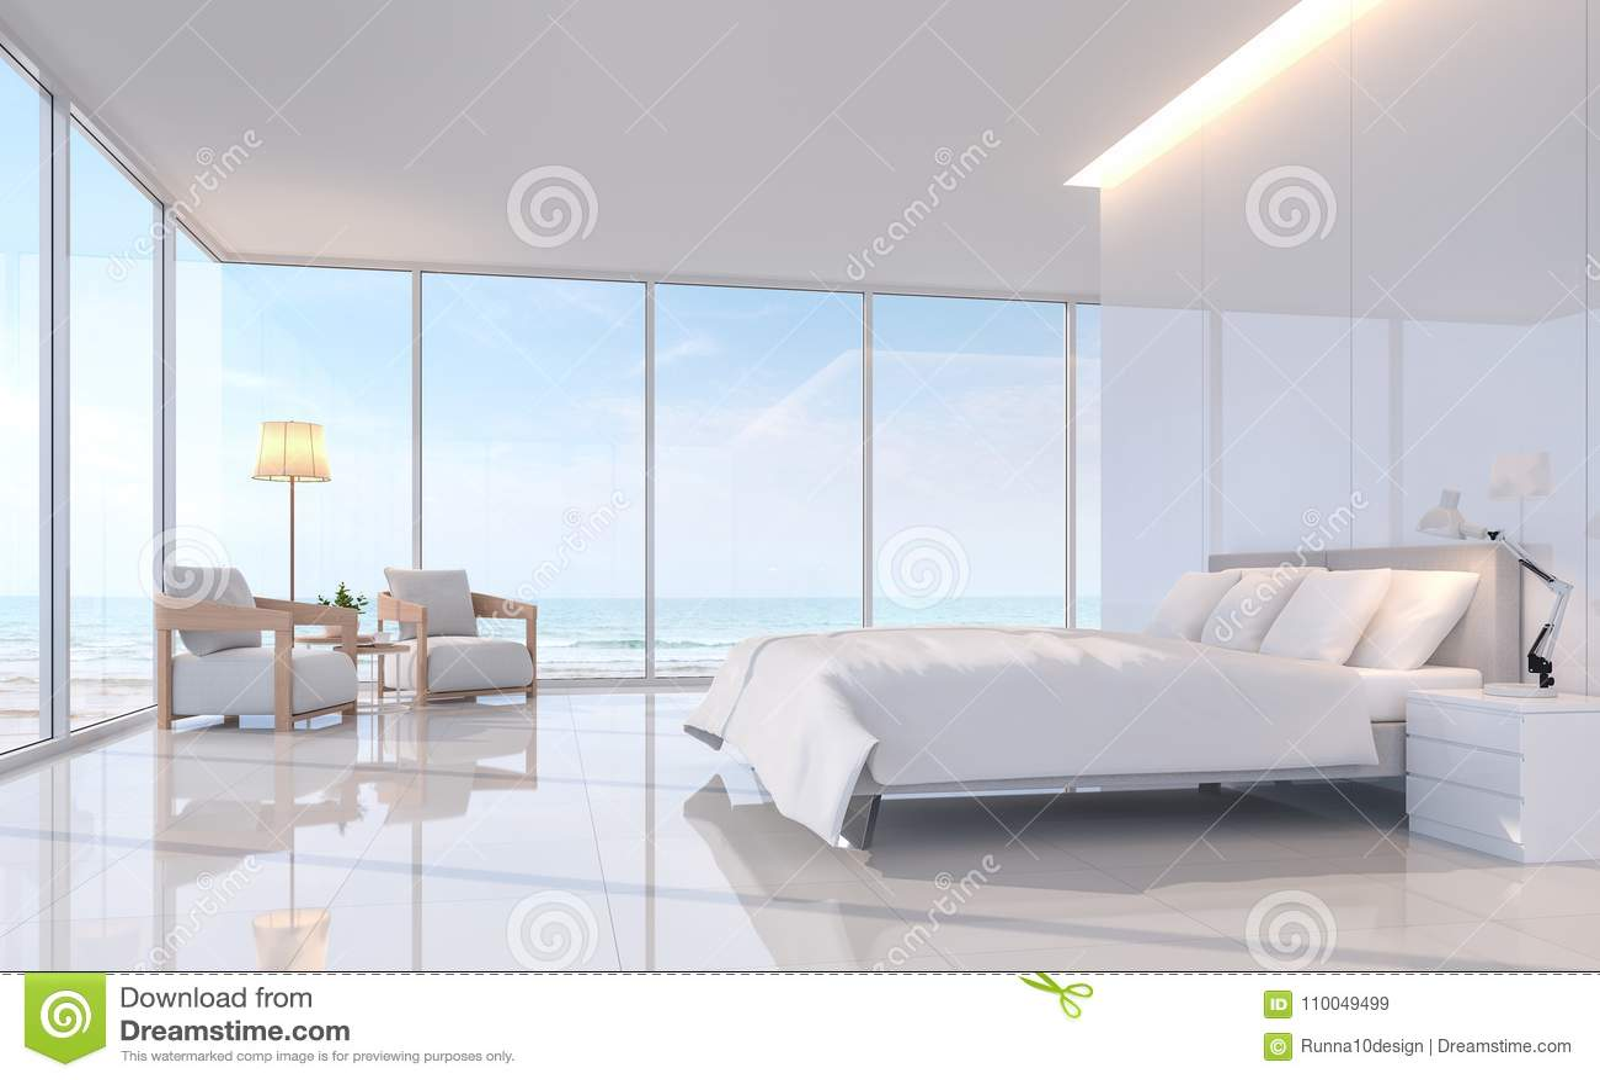 Ausgezeichnet Moderne Betten Schlafzimmer Ideen - Heimat Ideen ...